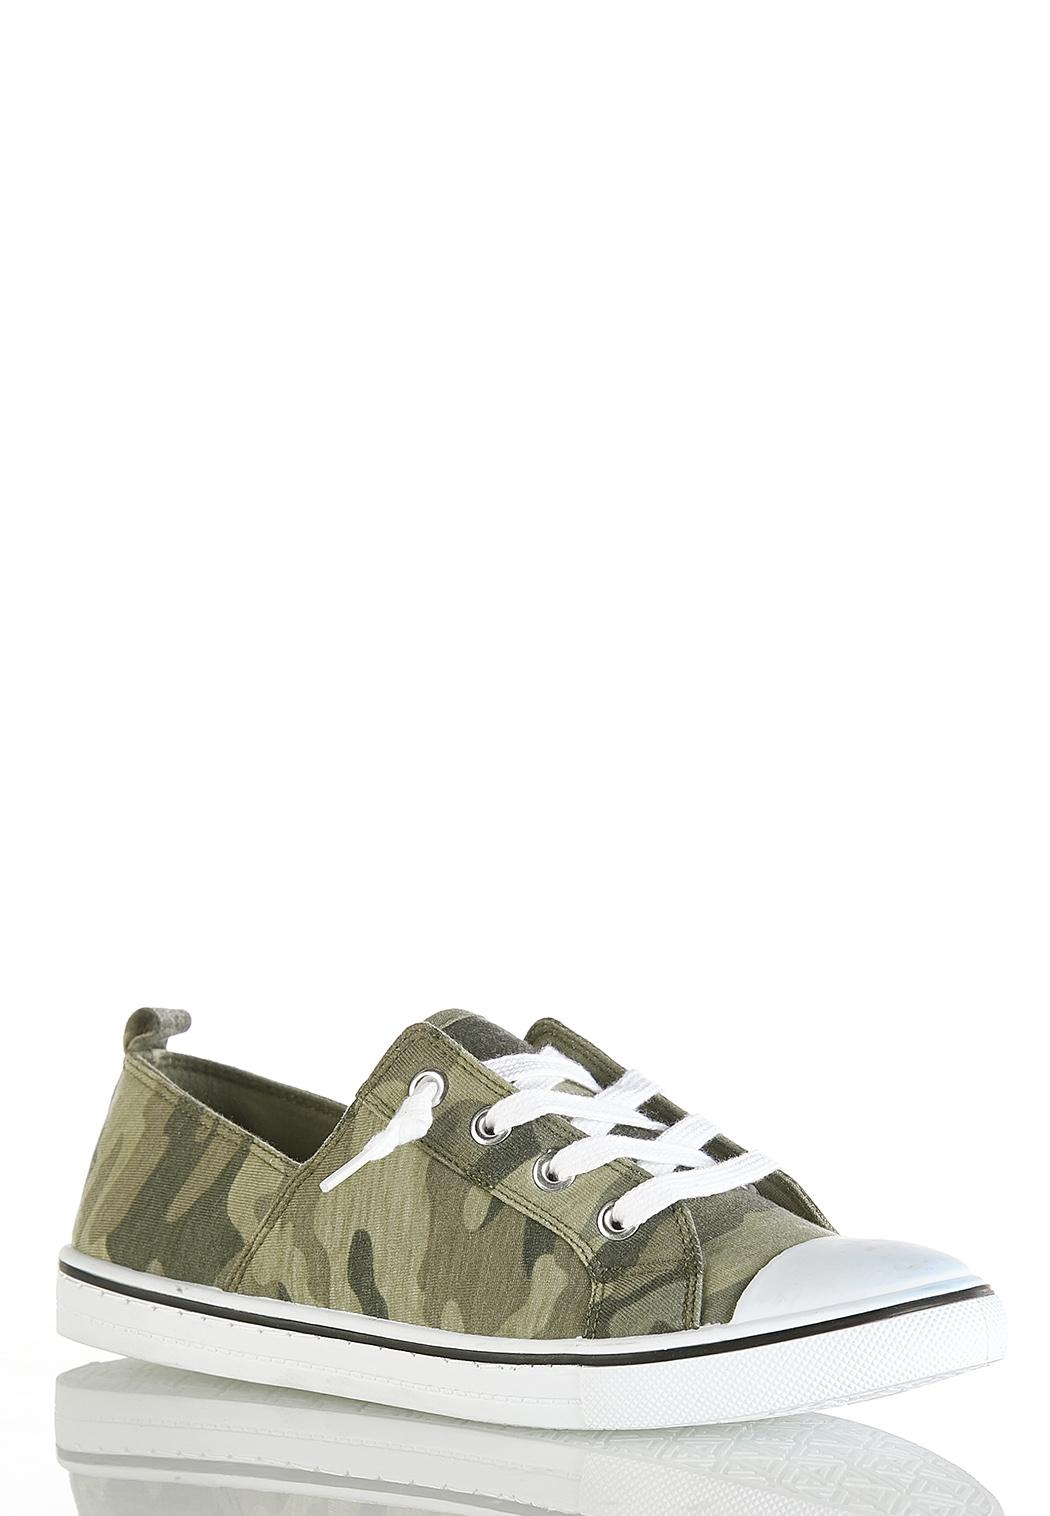 Camo Toe Cap Sneakers